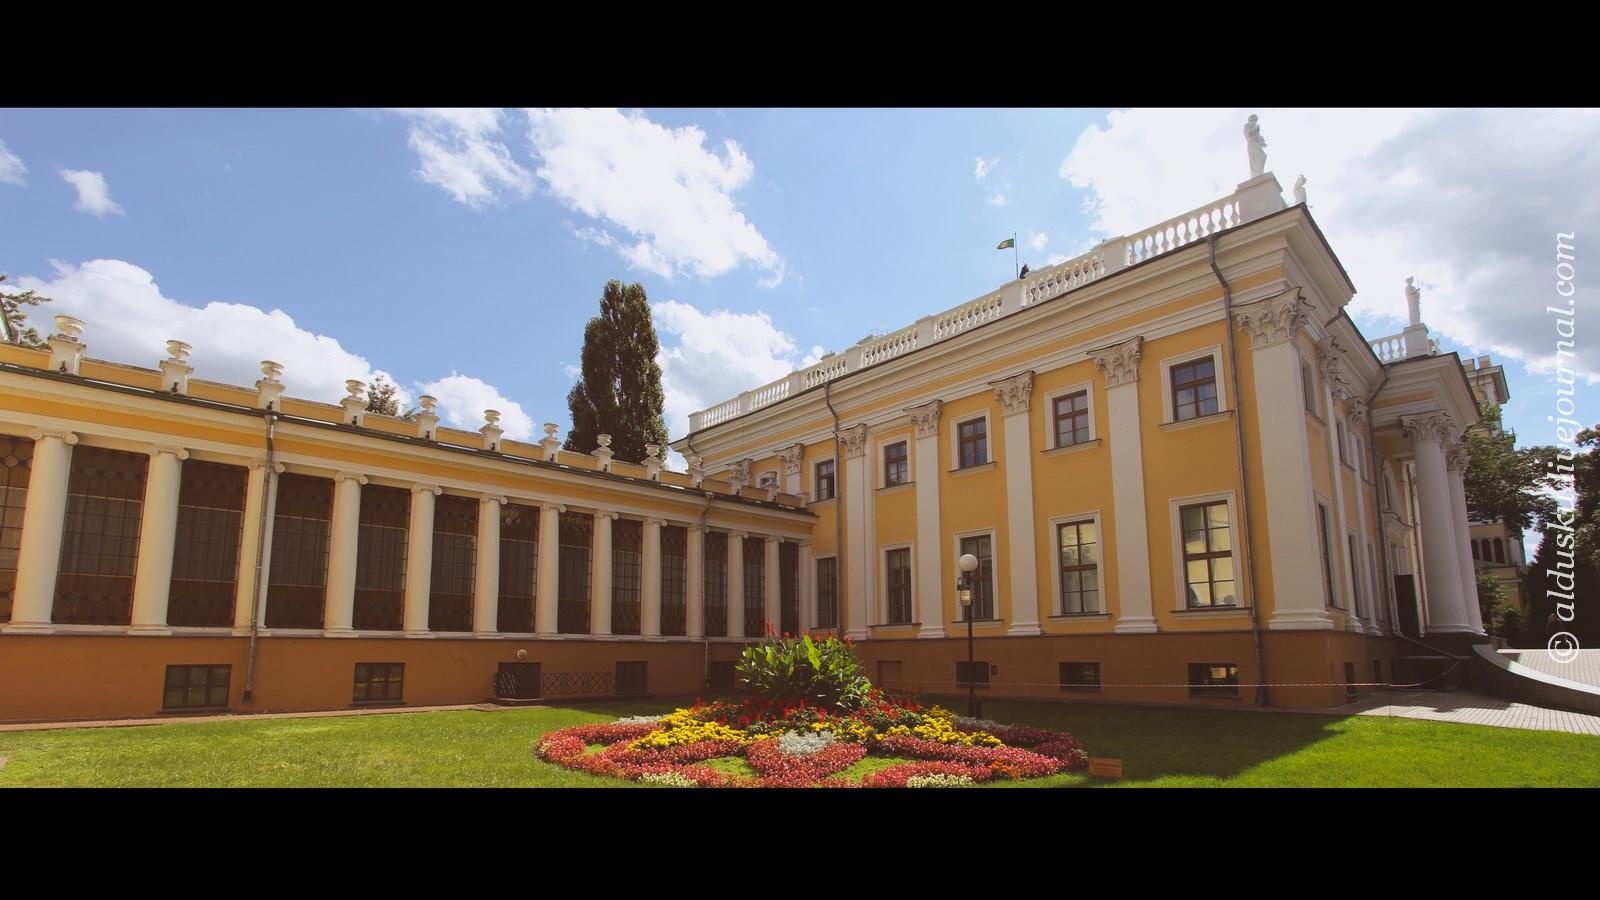 Слева: Оранжерея Дворца Румянцевых и Паскевичей